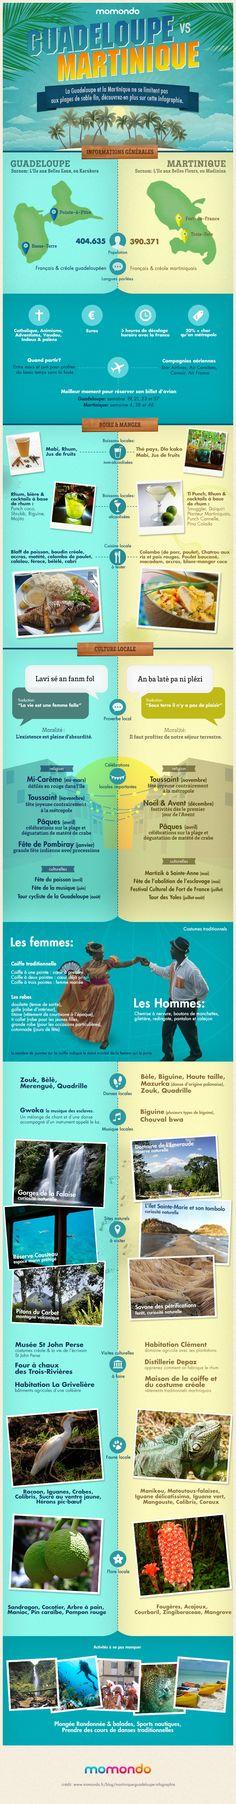 martinique et guadeloupe infographie